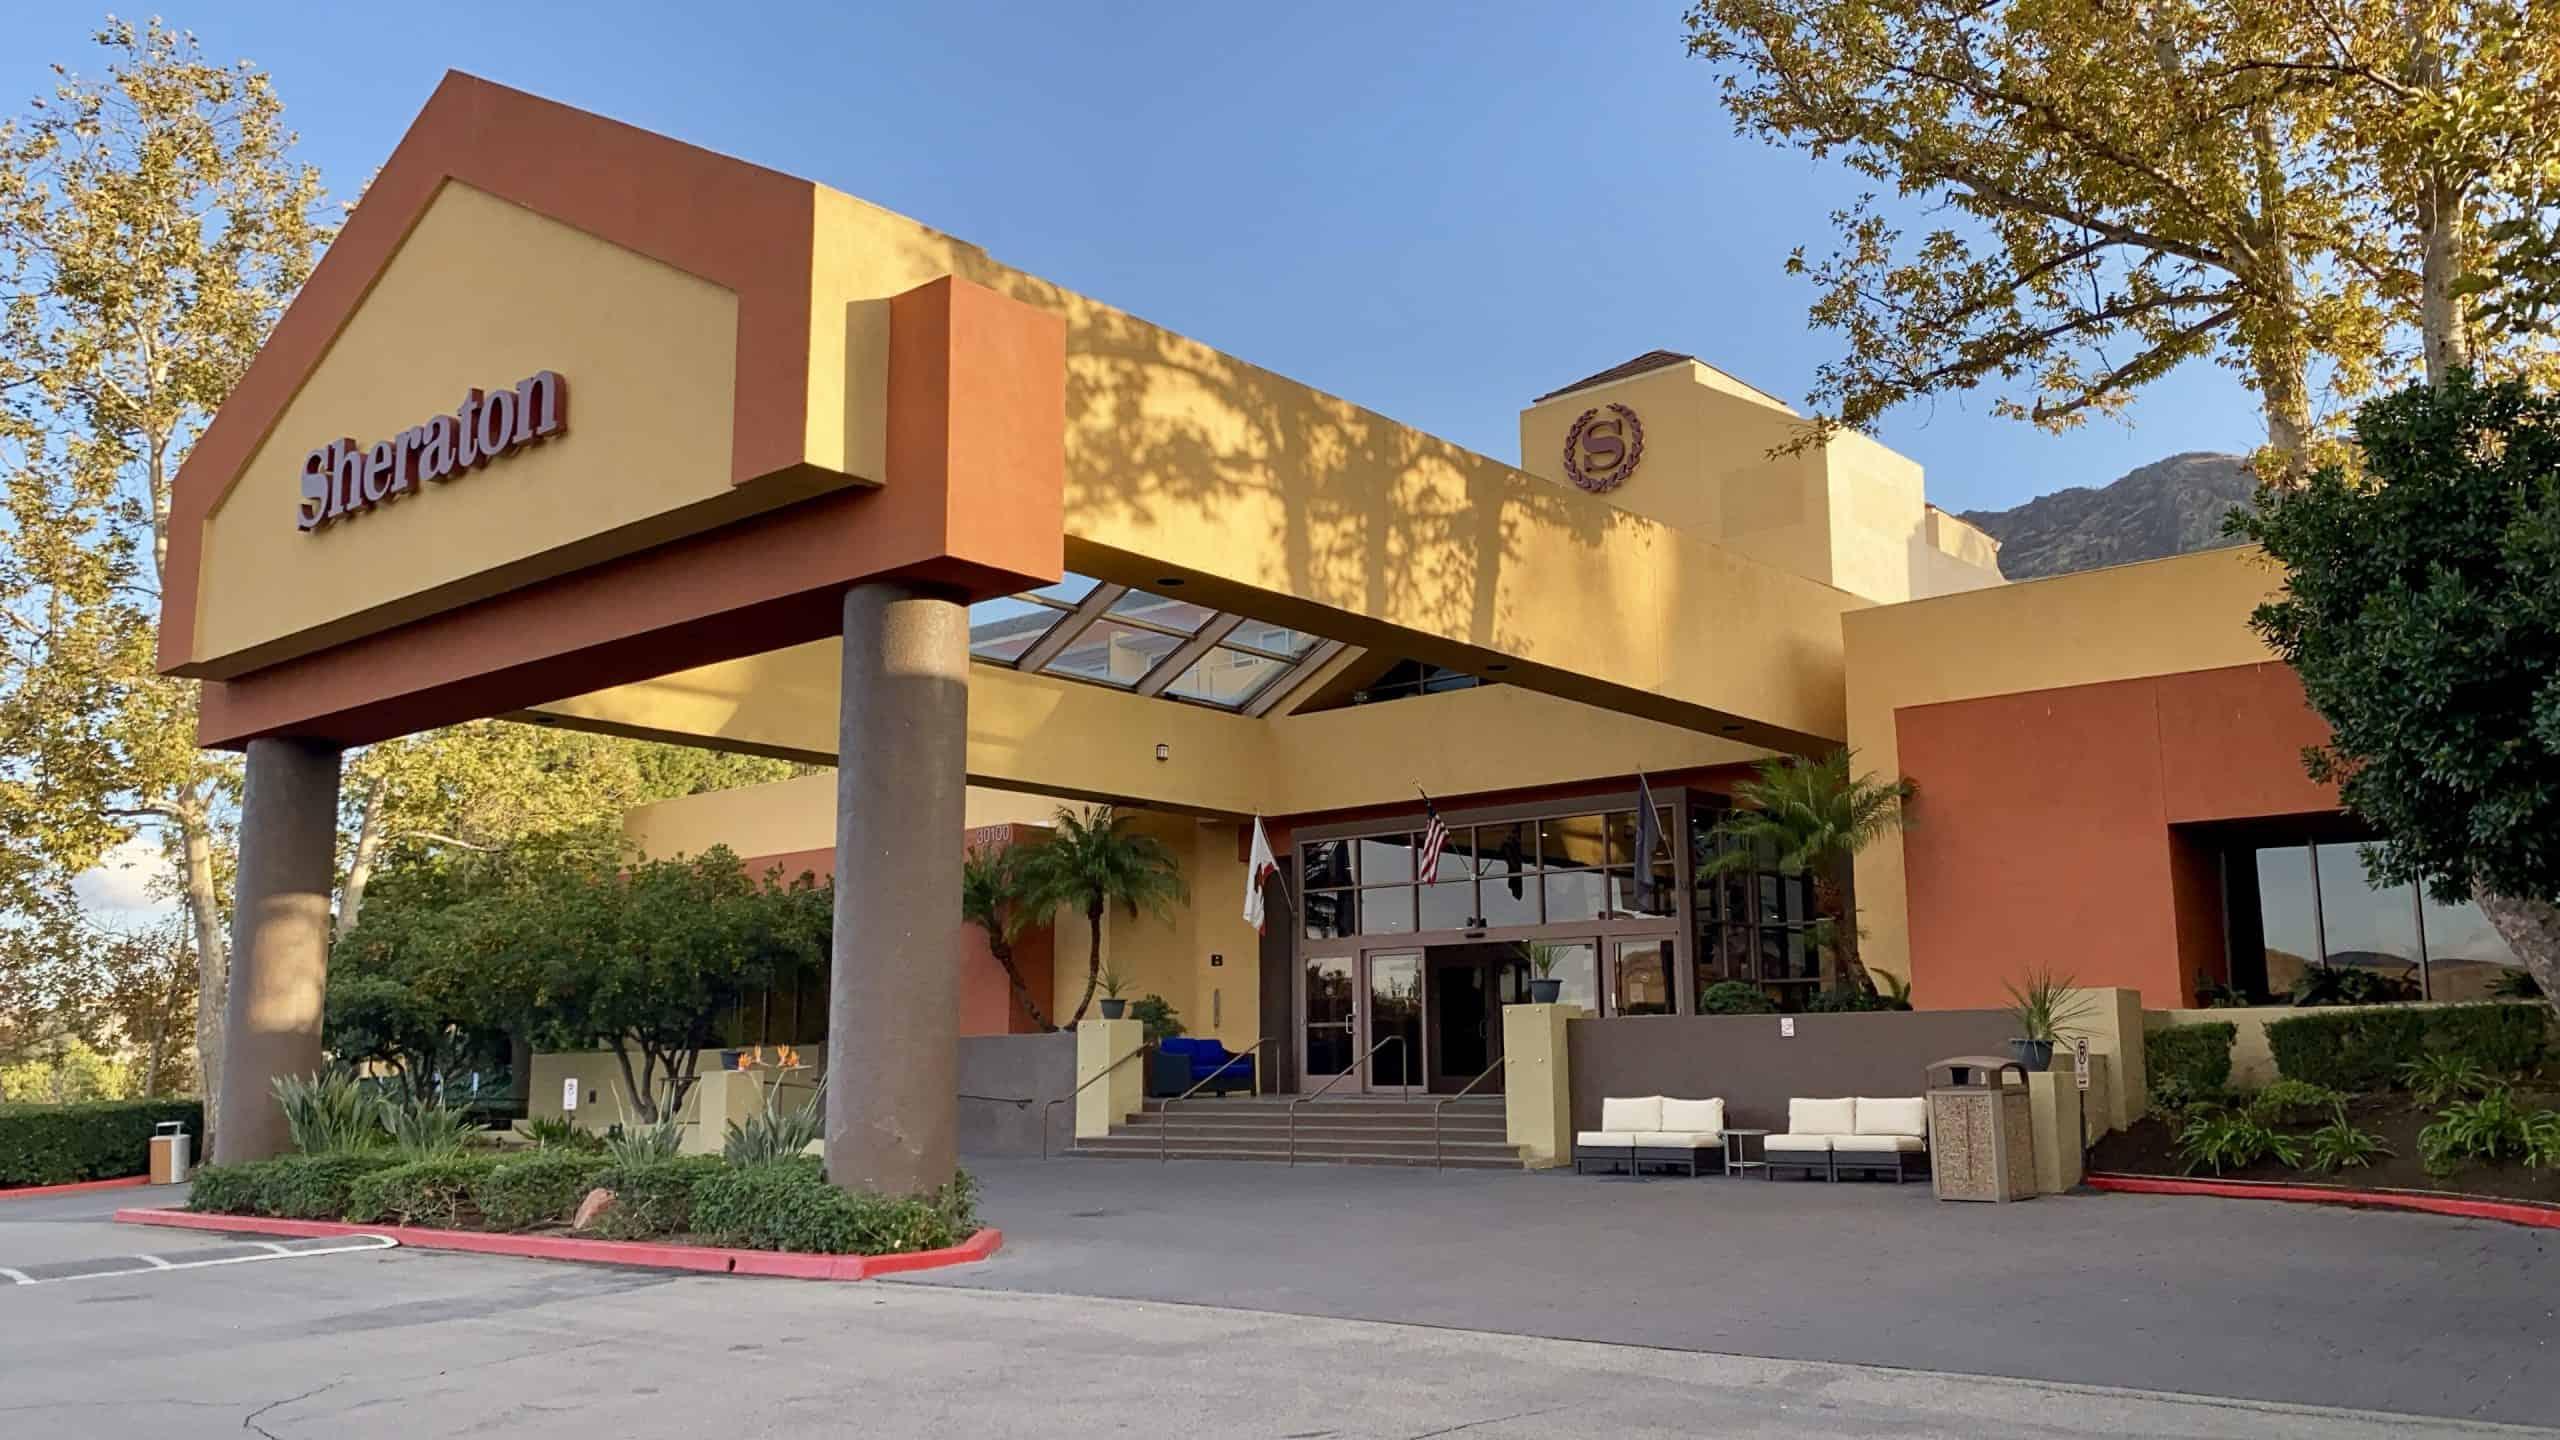 Sheraton Agoura Hills Hotel